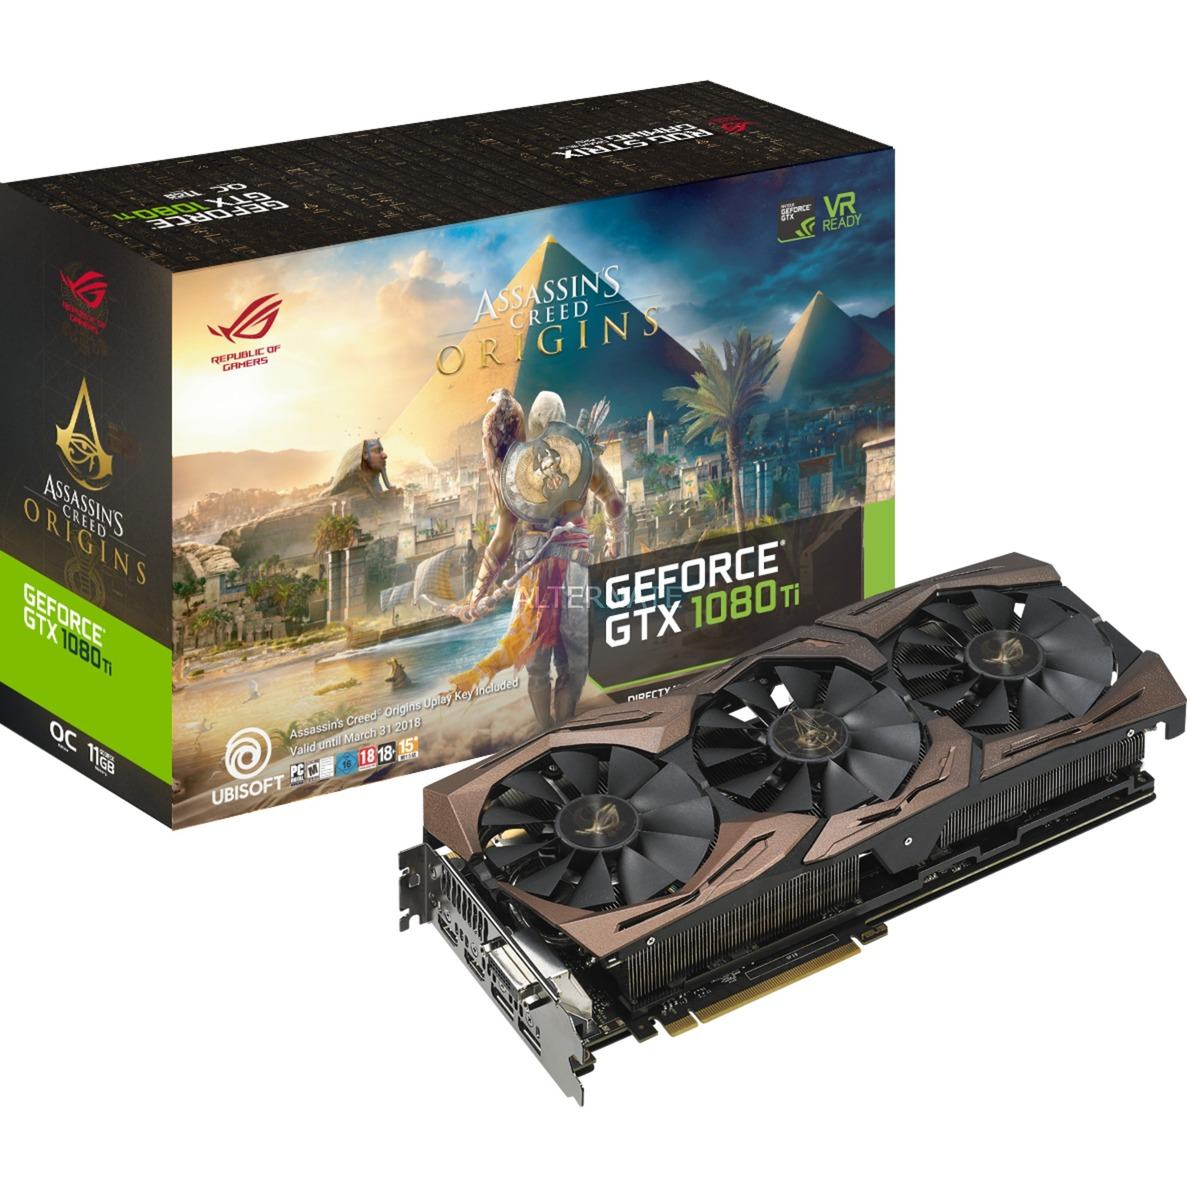 GeForce GTX 1080 Ti STRIX AC ORIGINS, Tarjeta gráfica